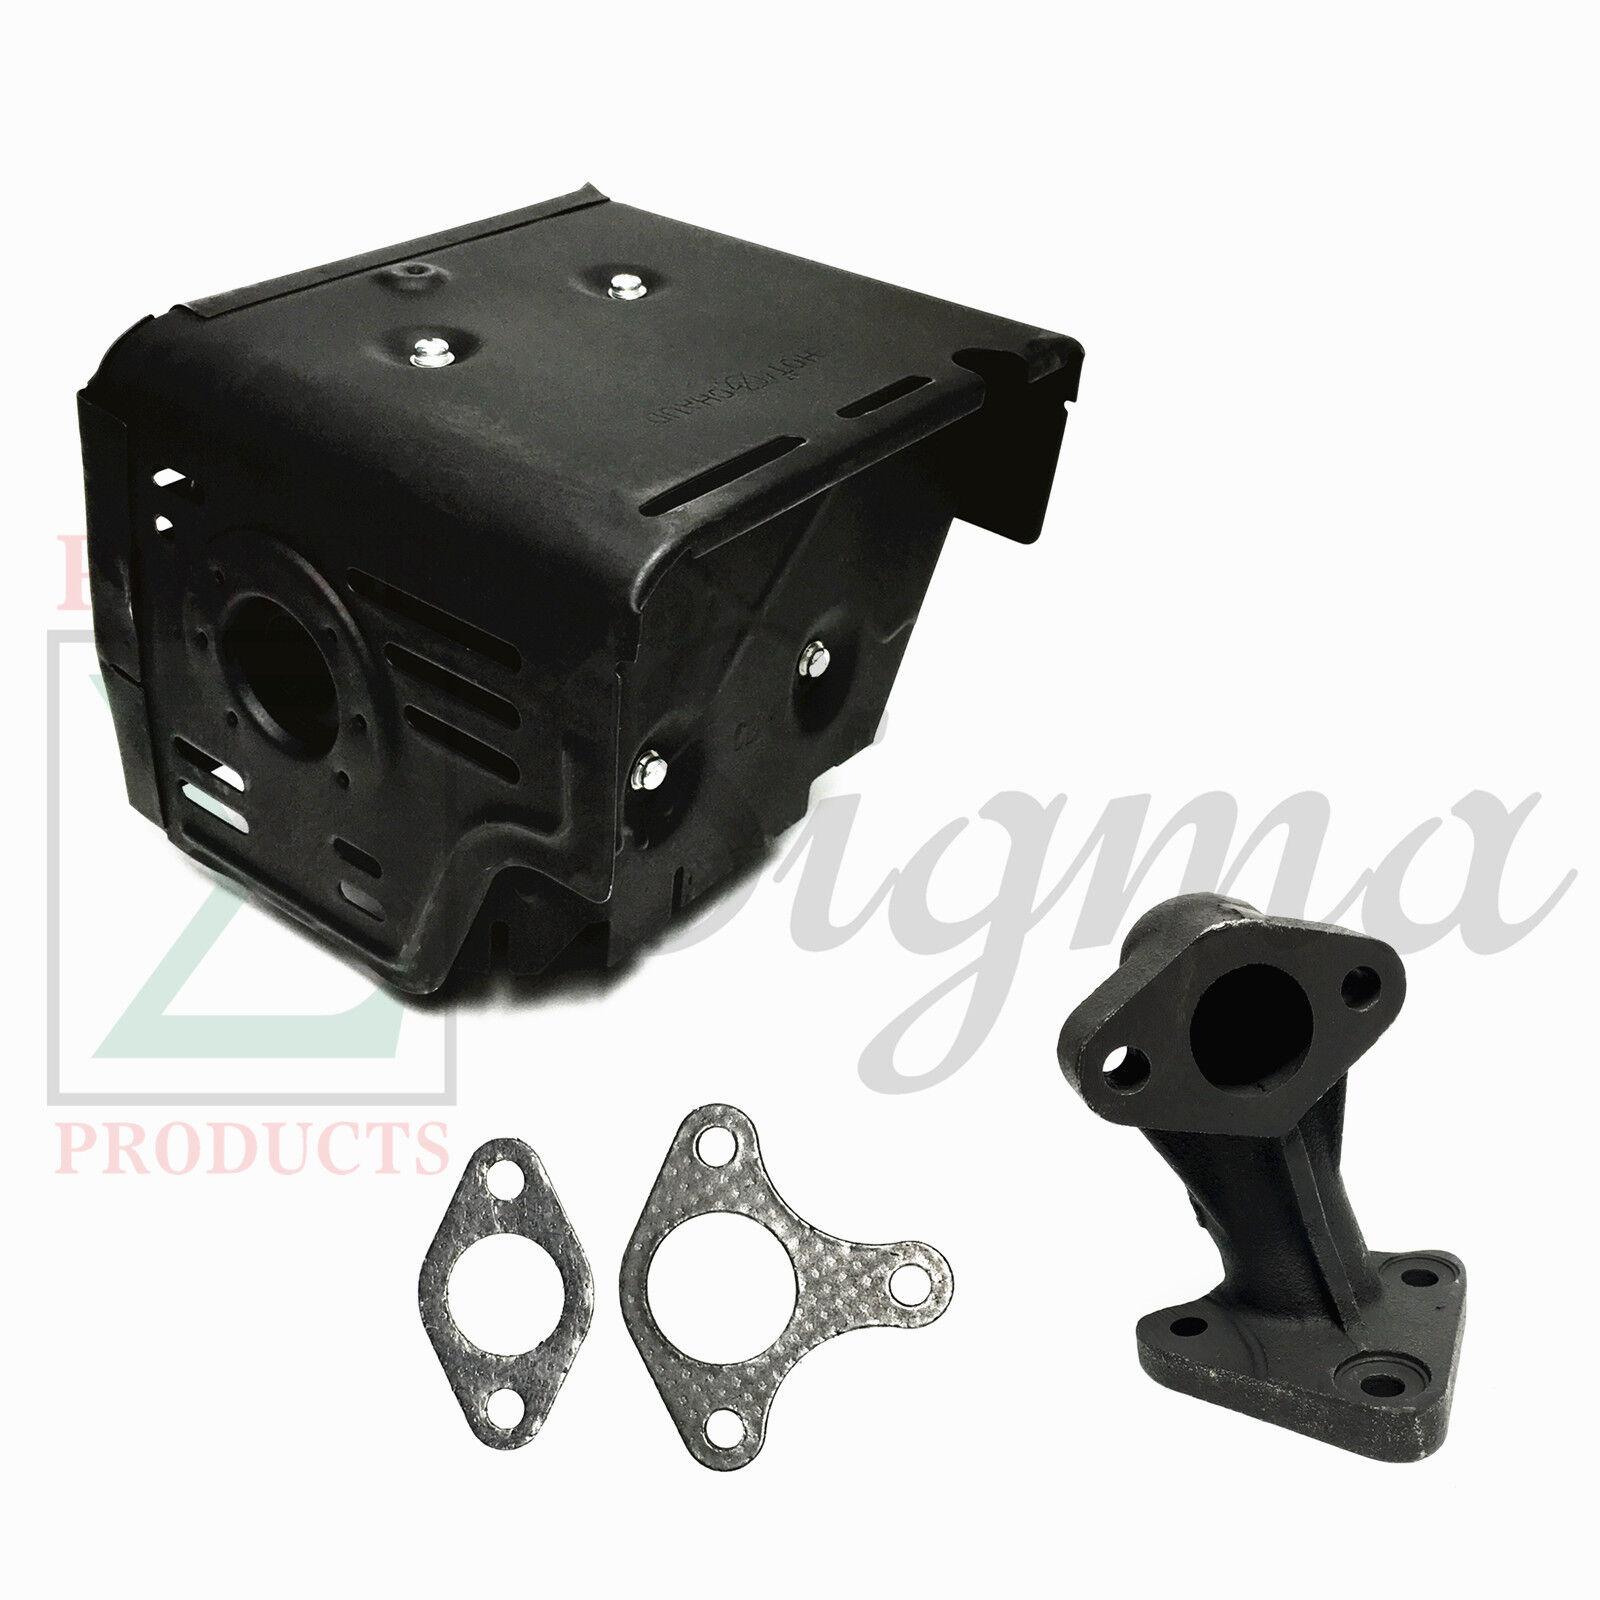 Muffler Exhaust For Generac 6565 4200 PSI 4.0GPM 420cc Gas P